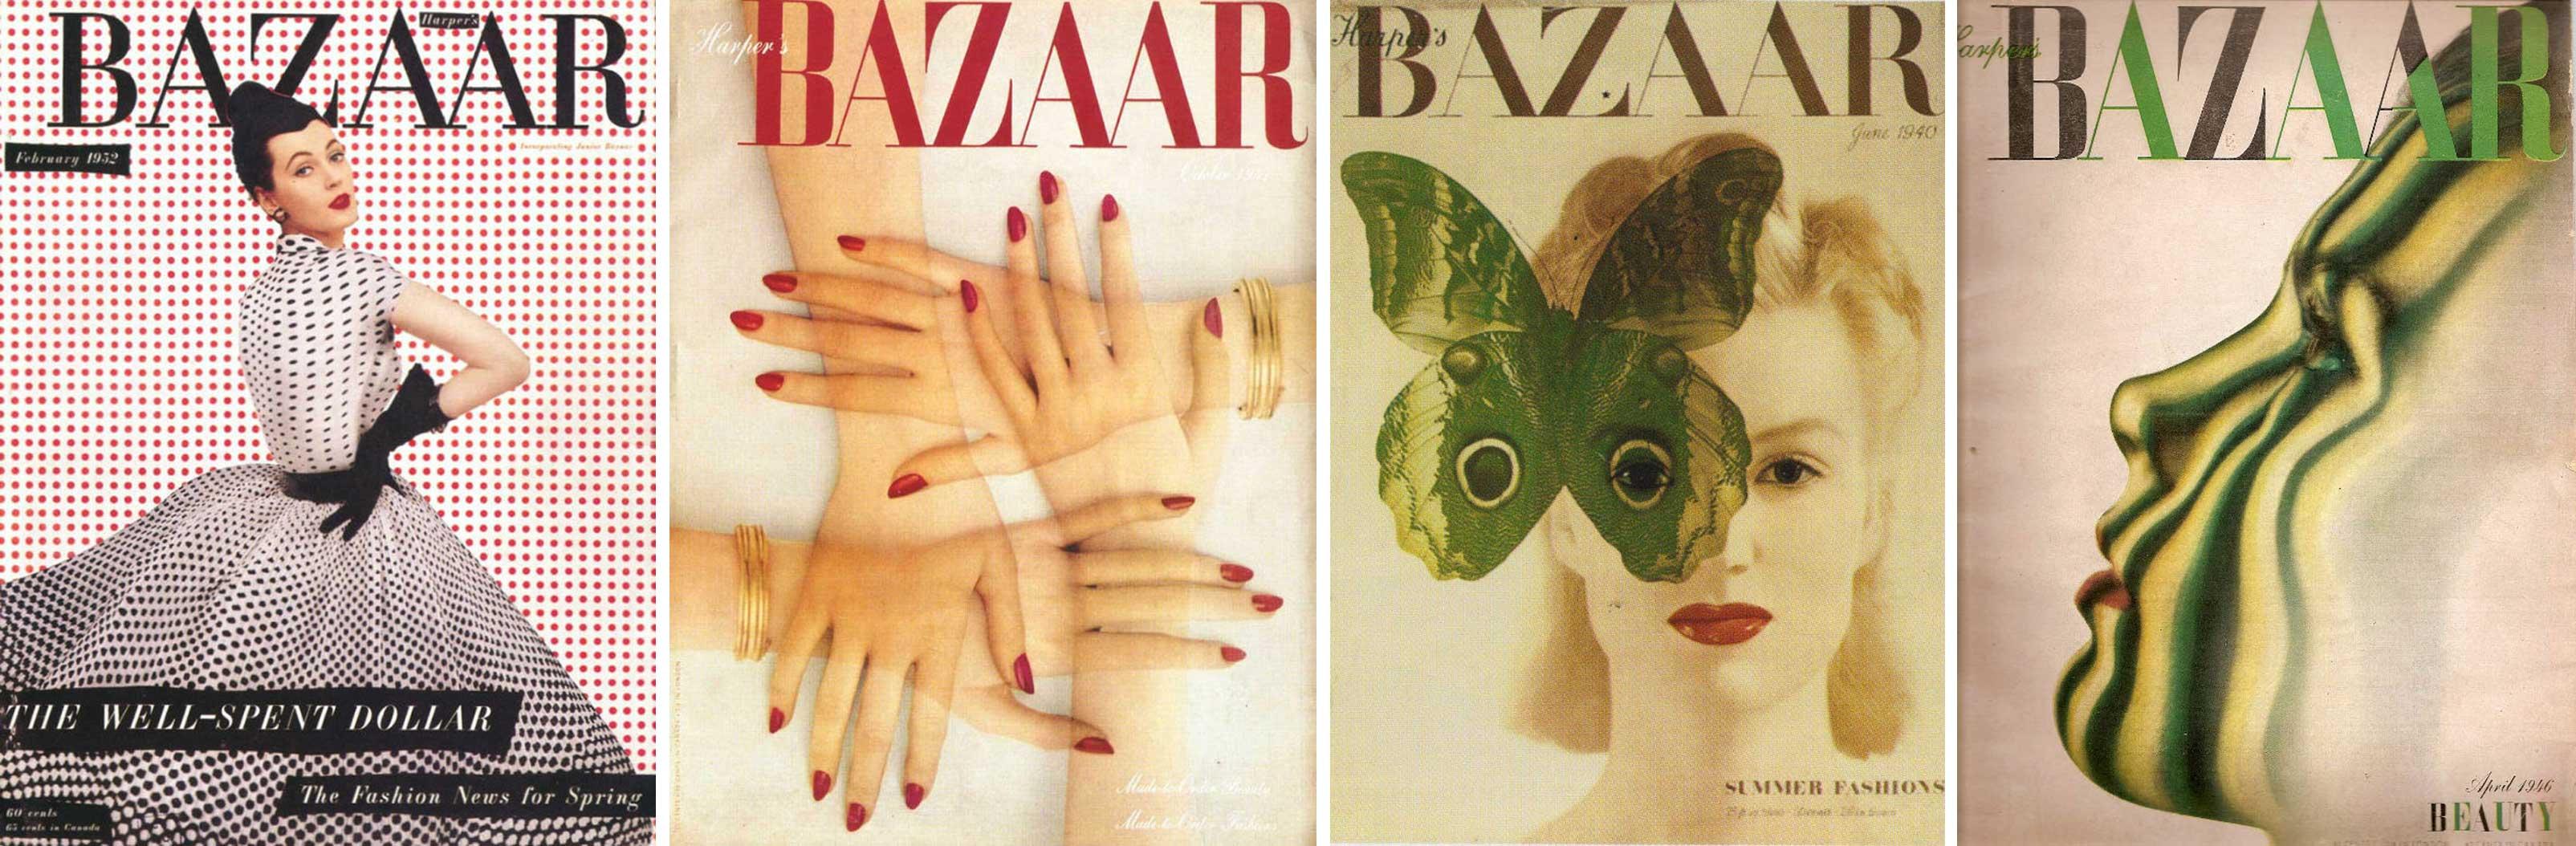 Alexey-Brodovitch-harper-s-bazaar-couvertures-01